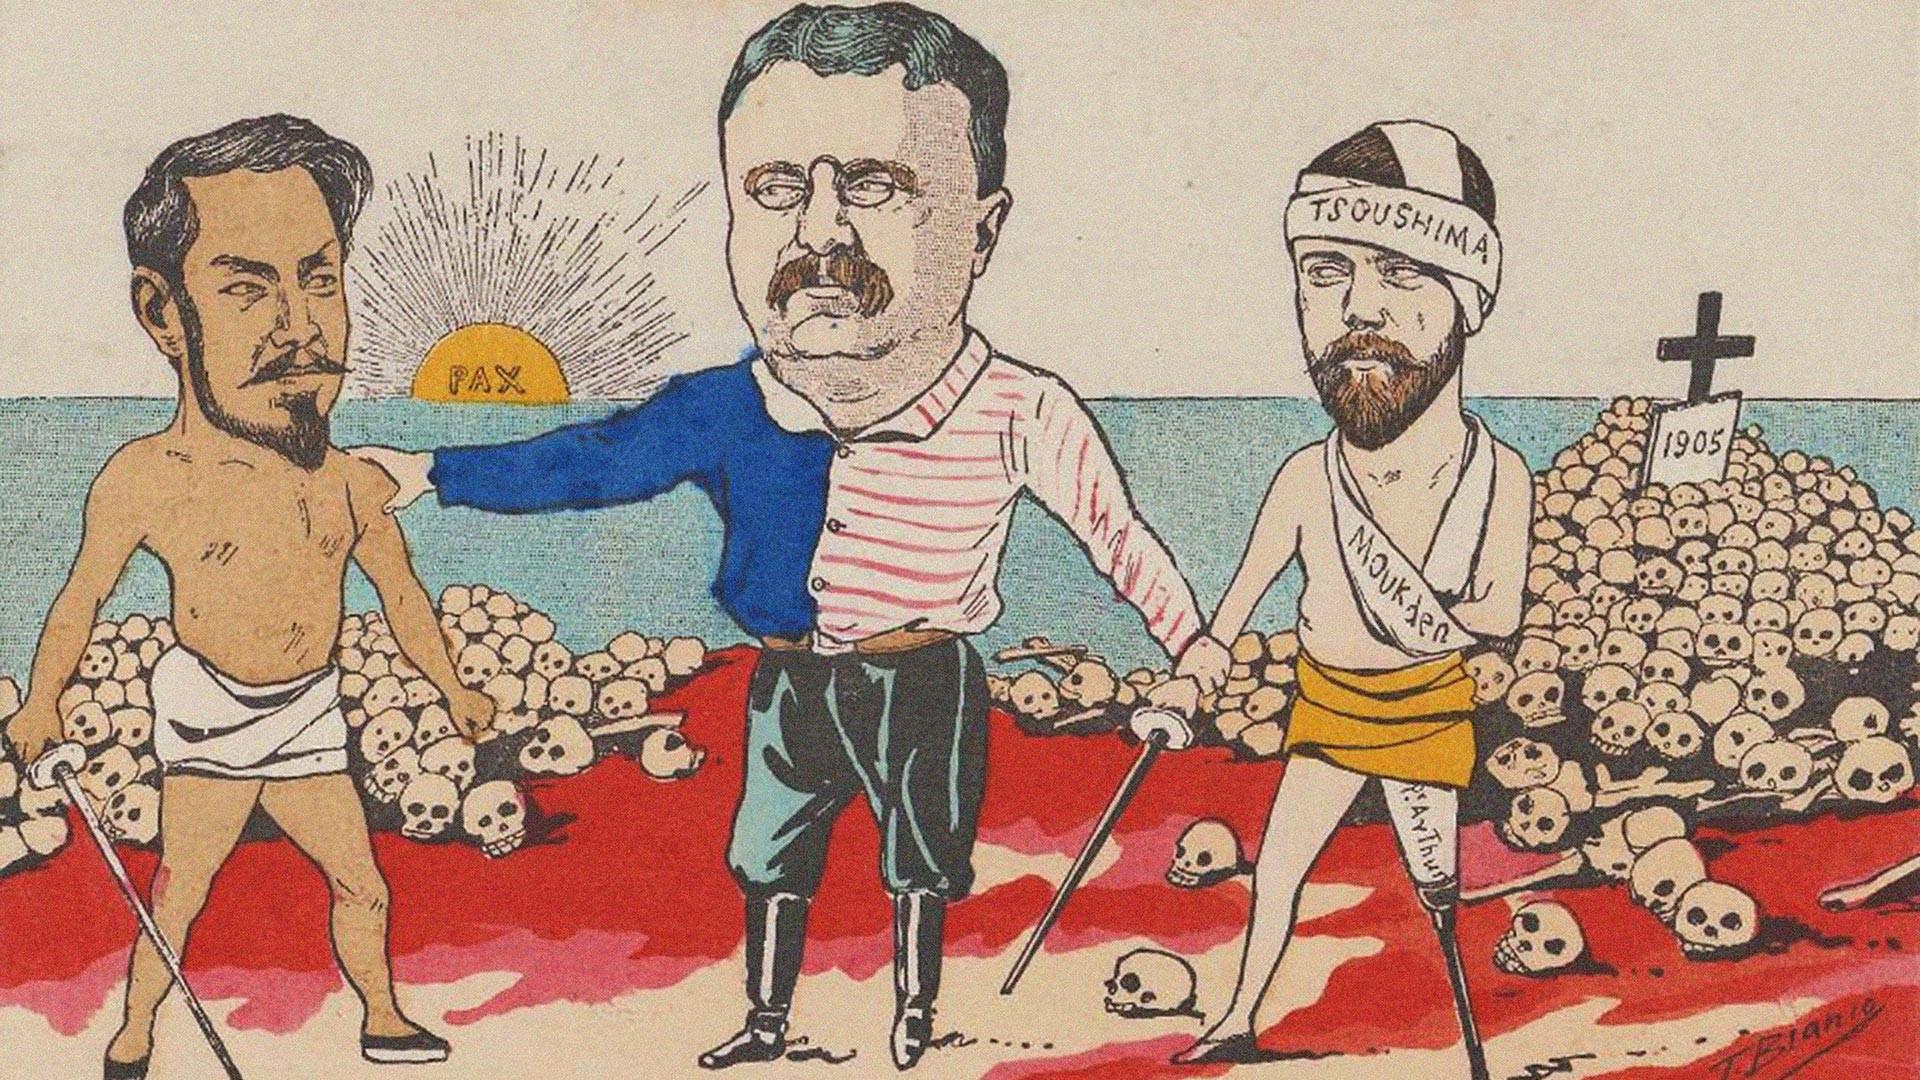 Карикатура Портсмутског мира, 1905.